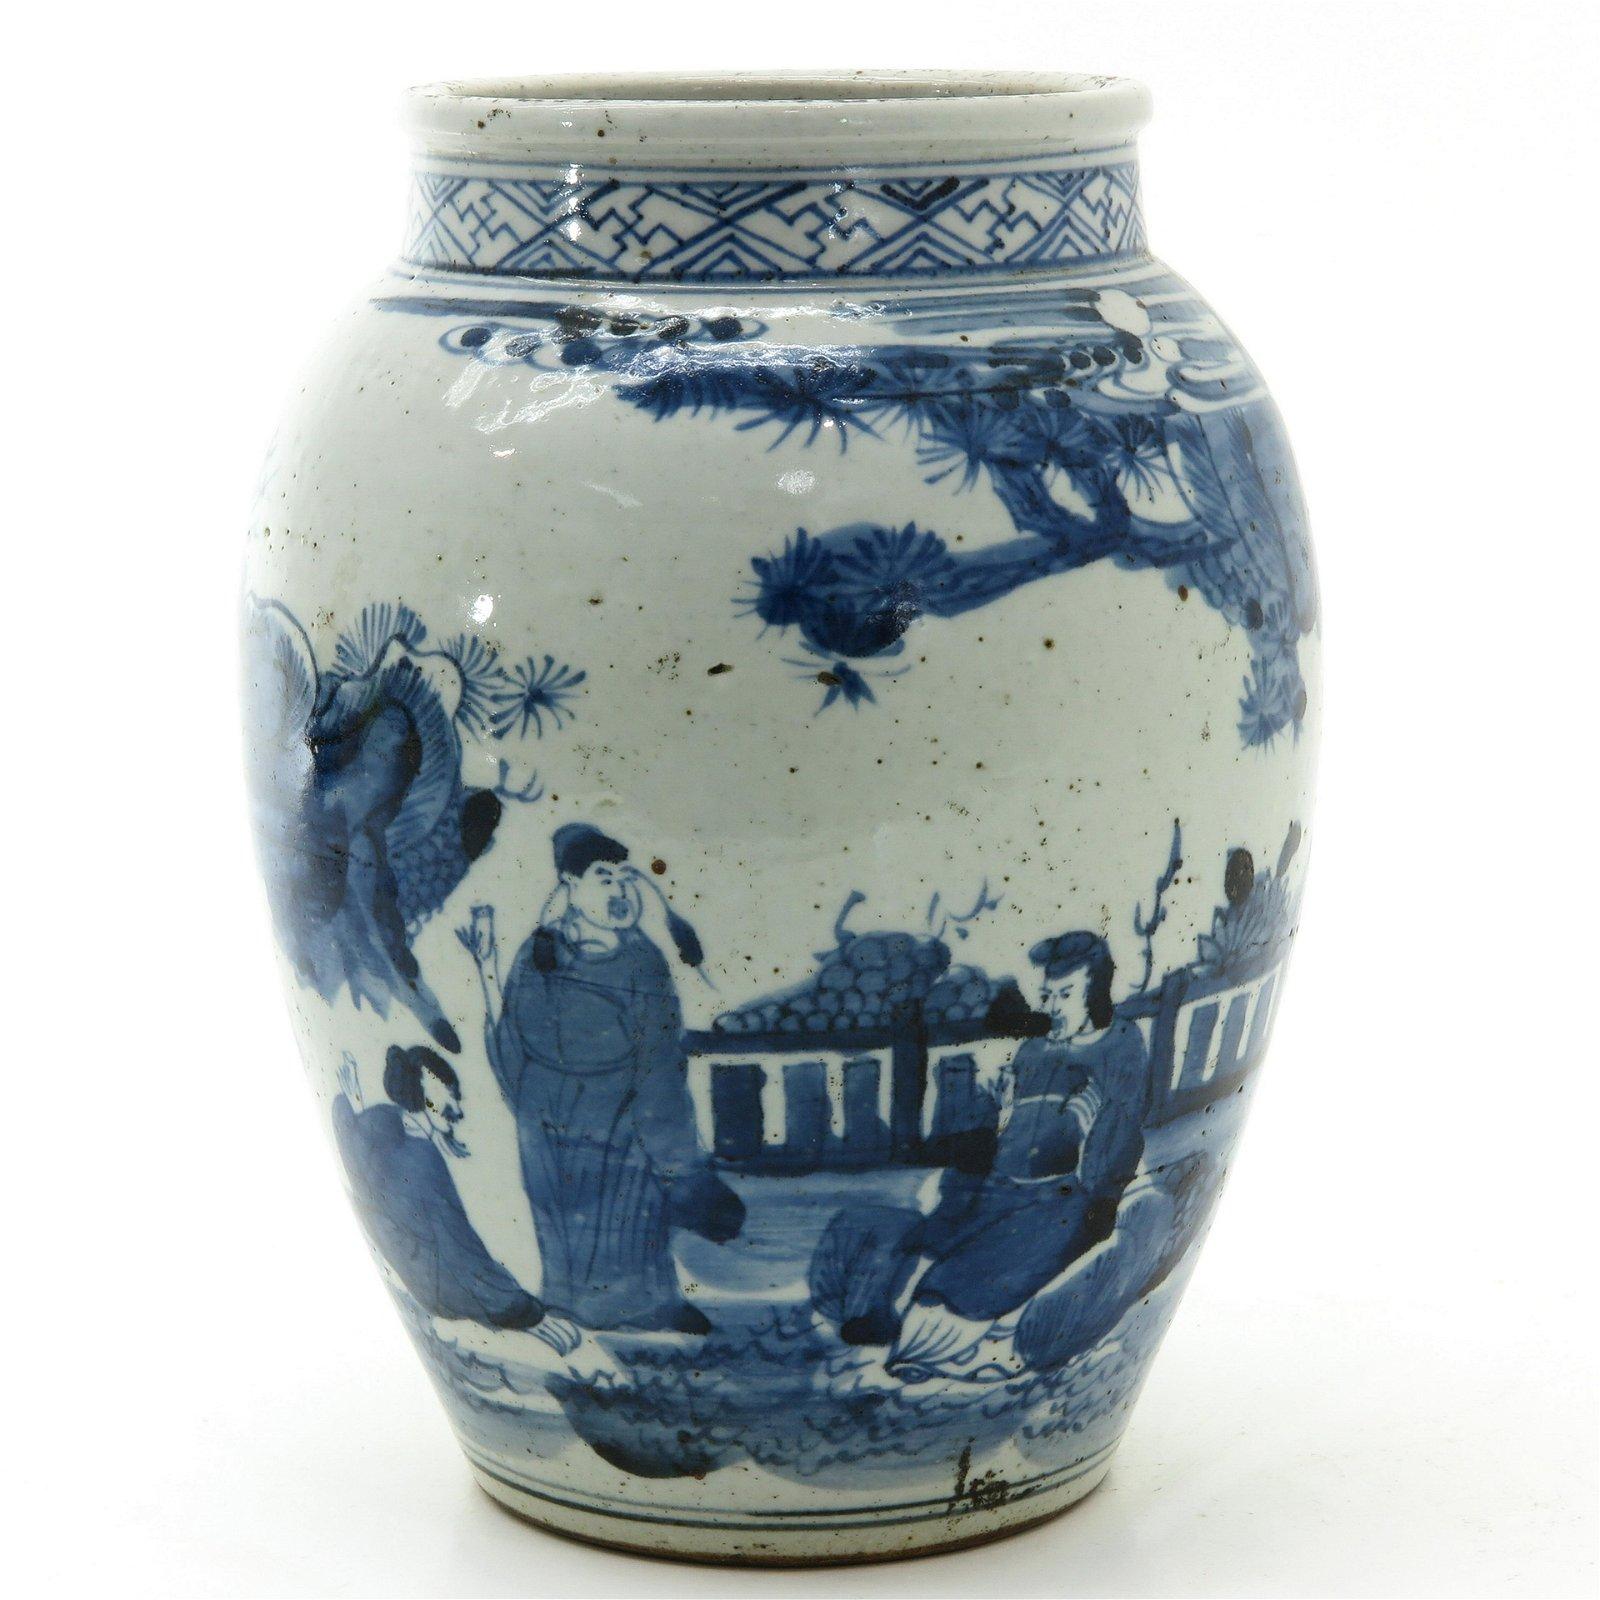 A Blue and White Stoneware Vase